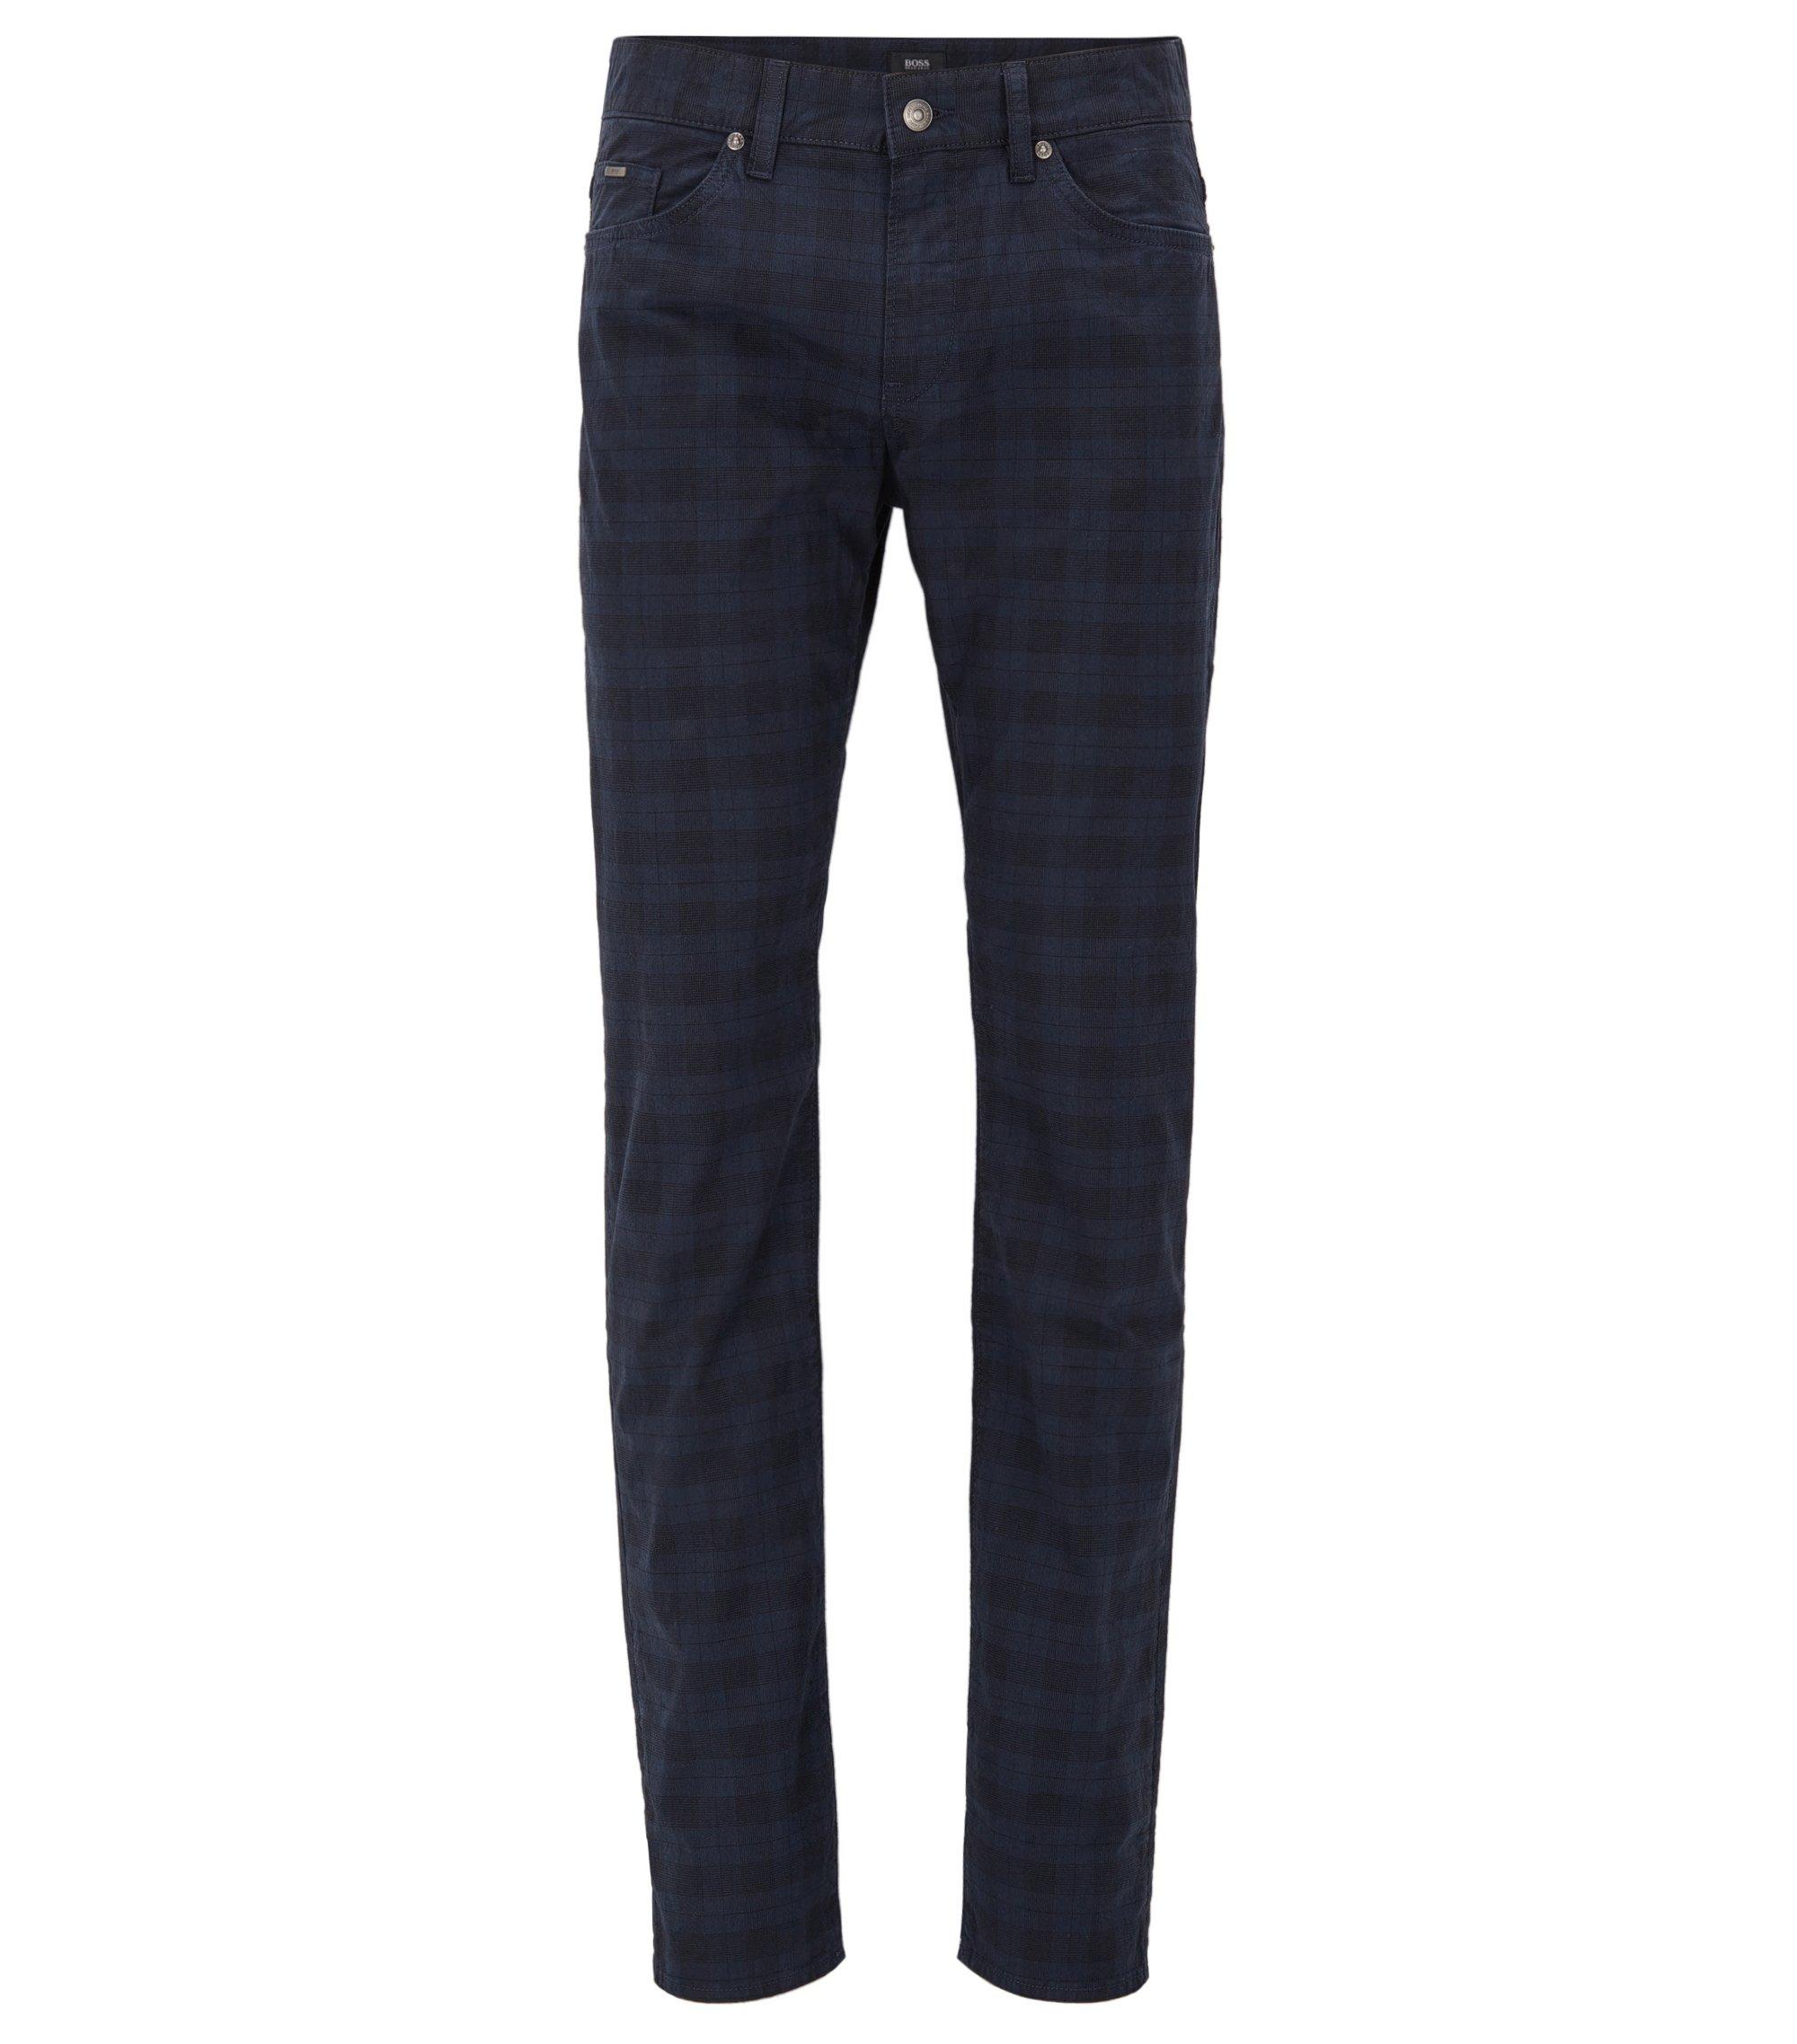 Jean Slim Fit en coton stretch, Bleu foncé